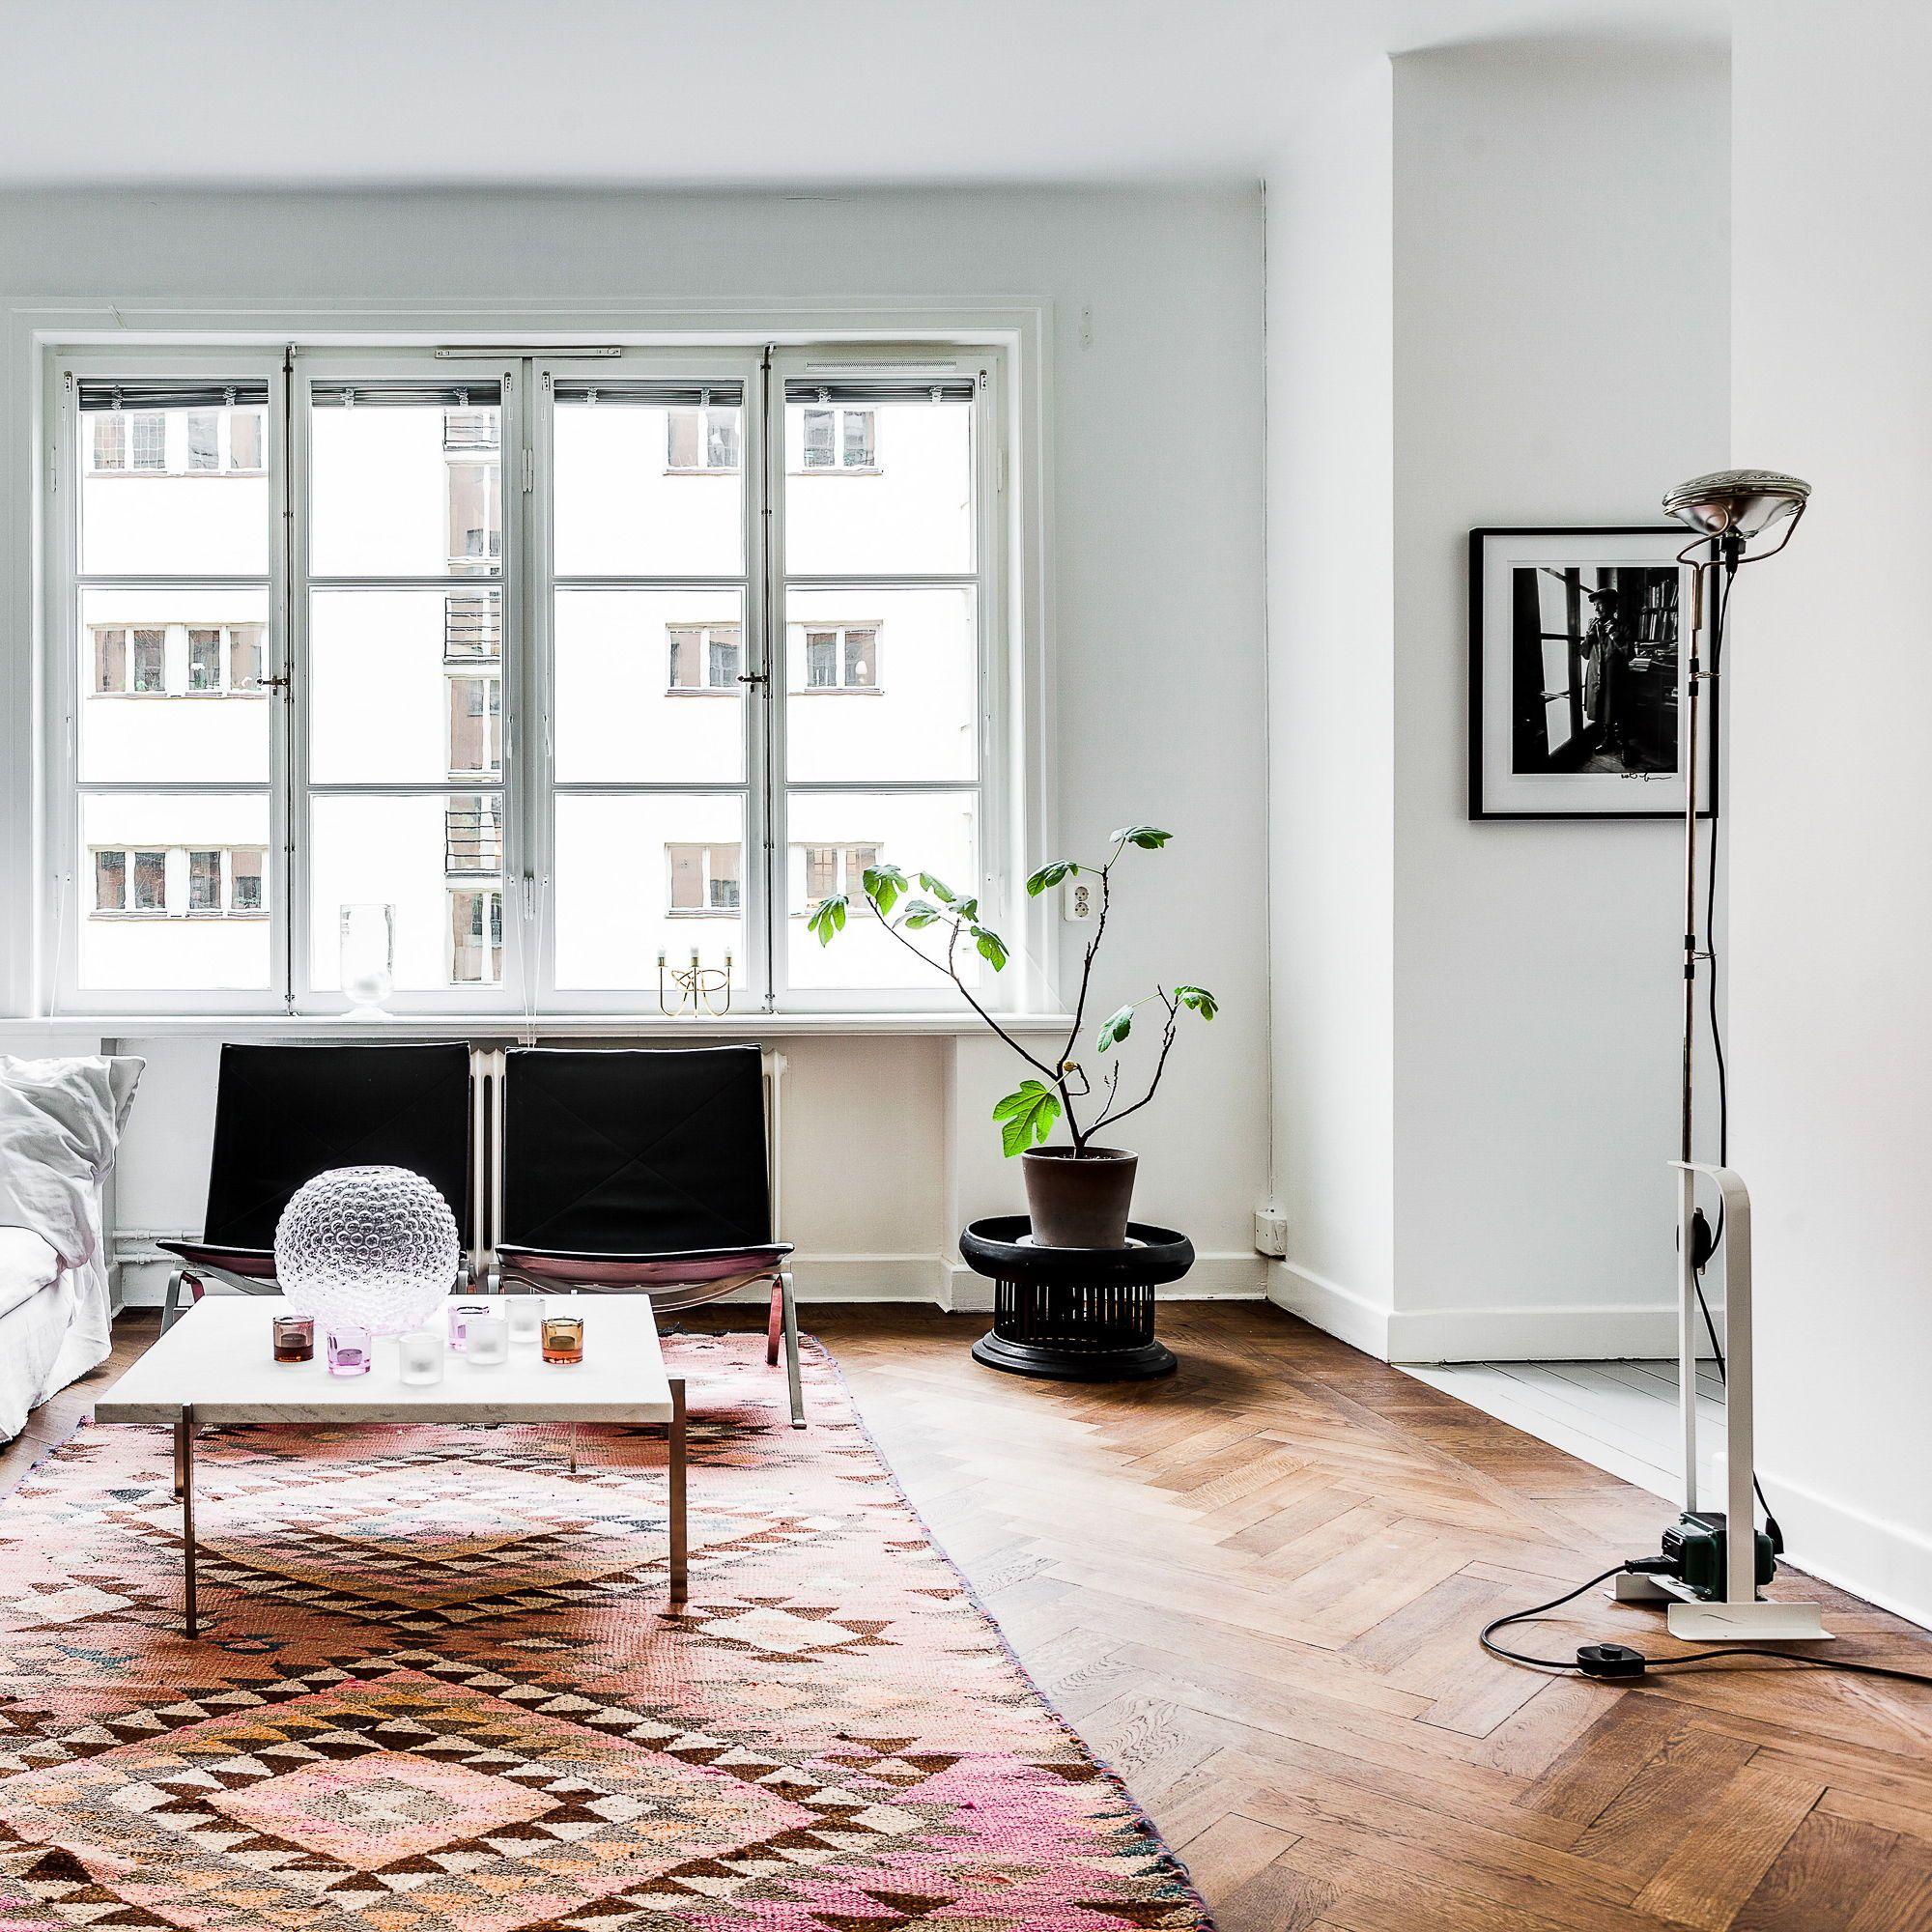 Industrial Timeless Imaginative Toio By Achille Pier Giacomo Castiglioni Is Comprised Modern Floor Lamp Design Floor Lamp Design Contemporary Floor Lamps